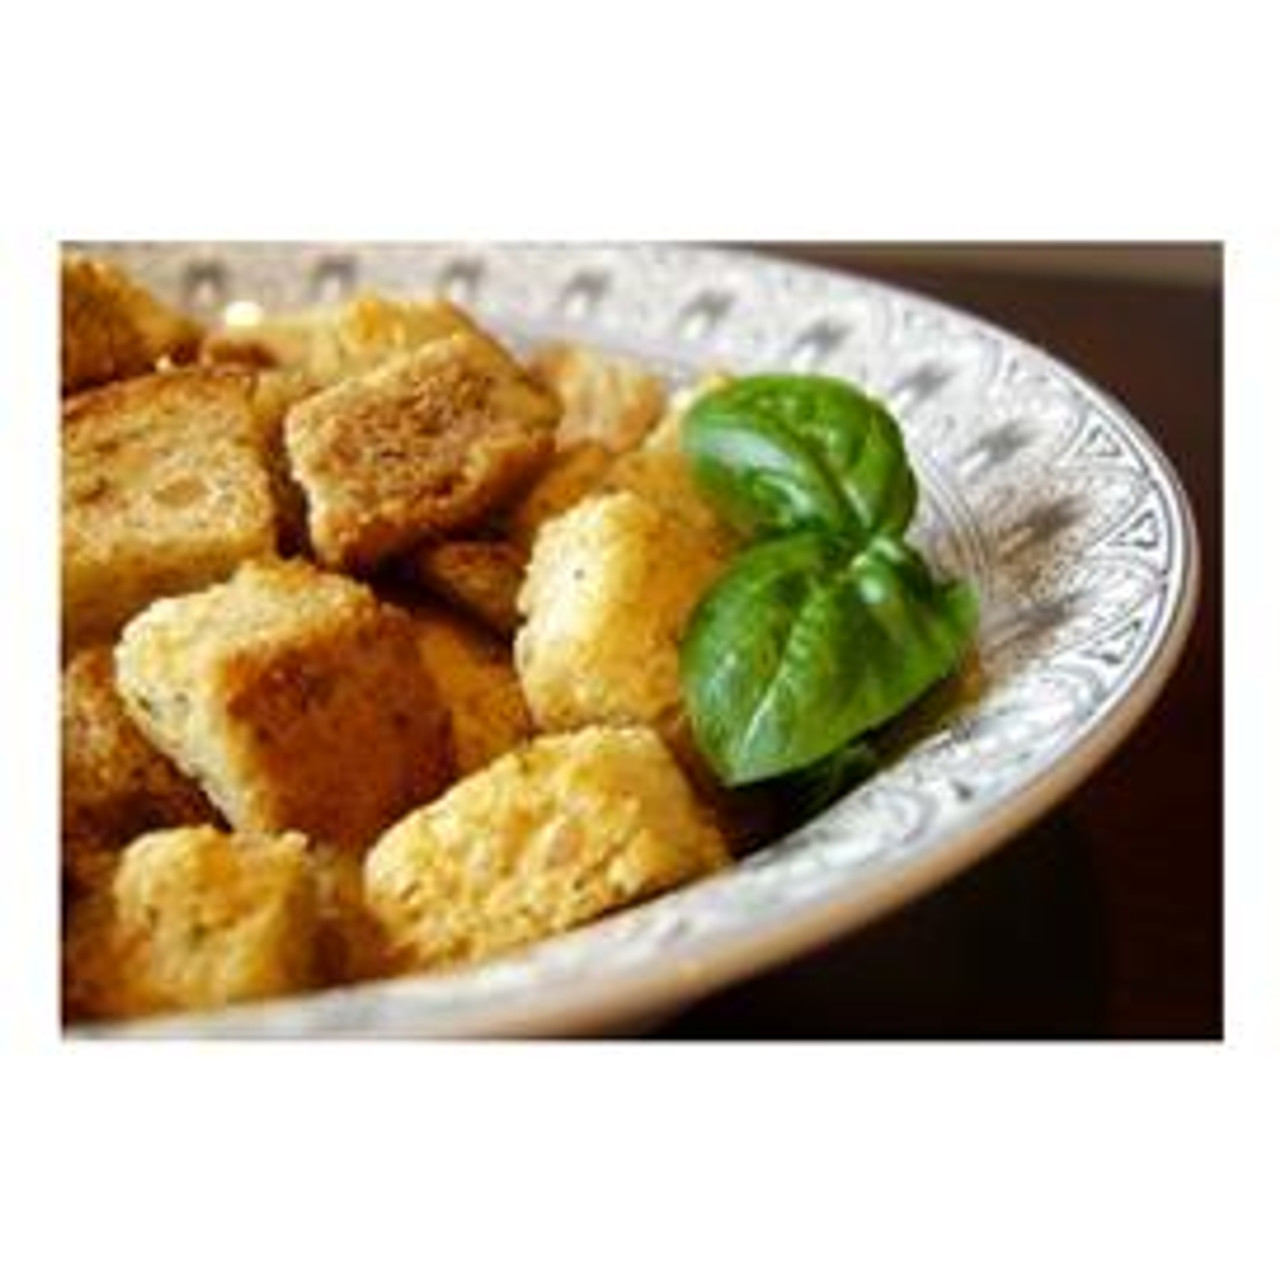 Iavarone Bros Own Garlic & Herb Croutons